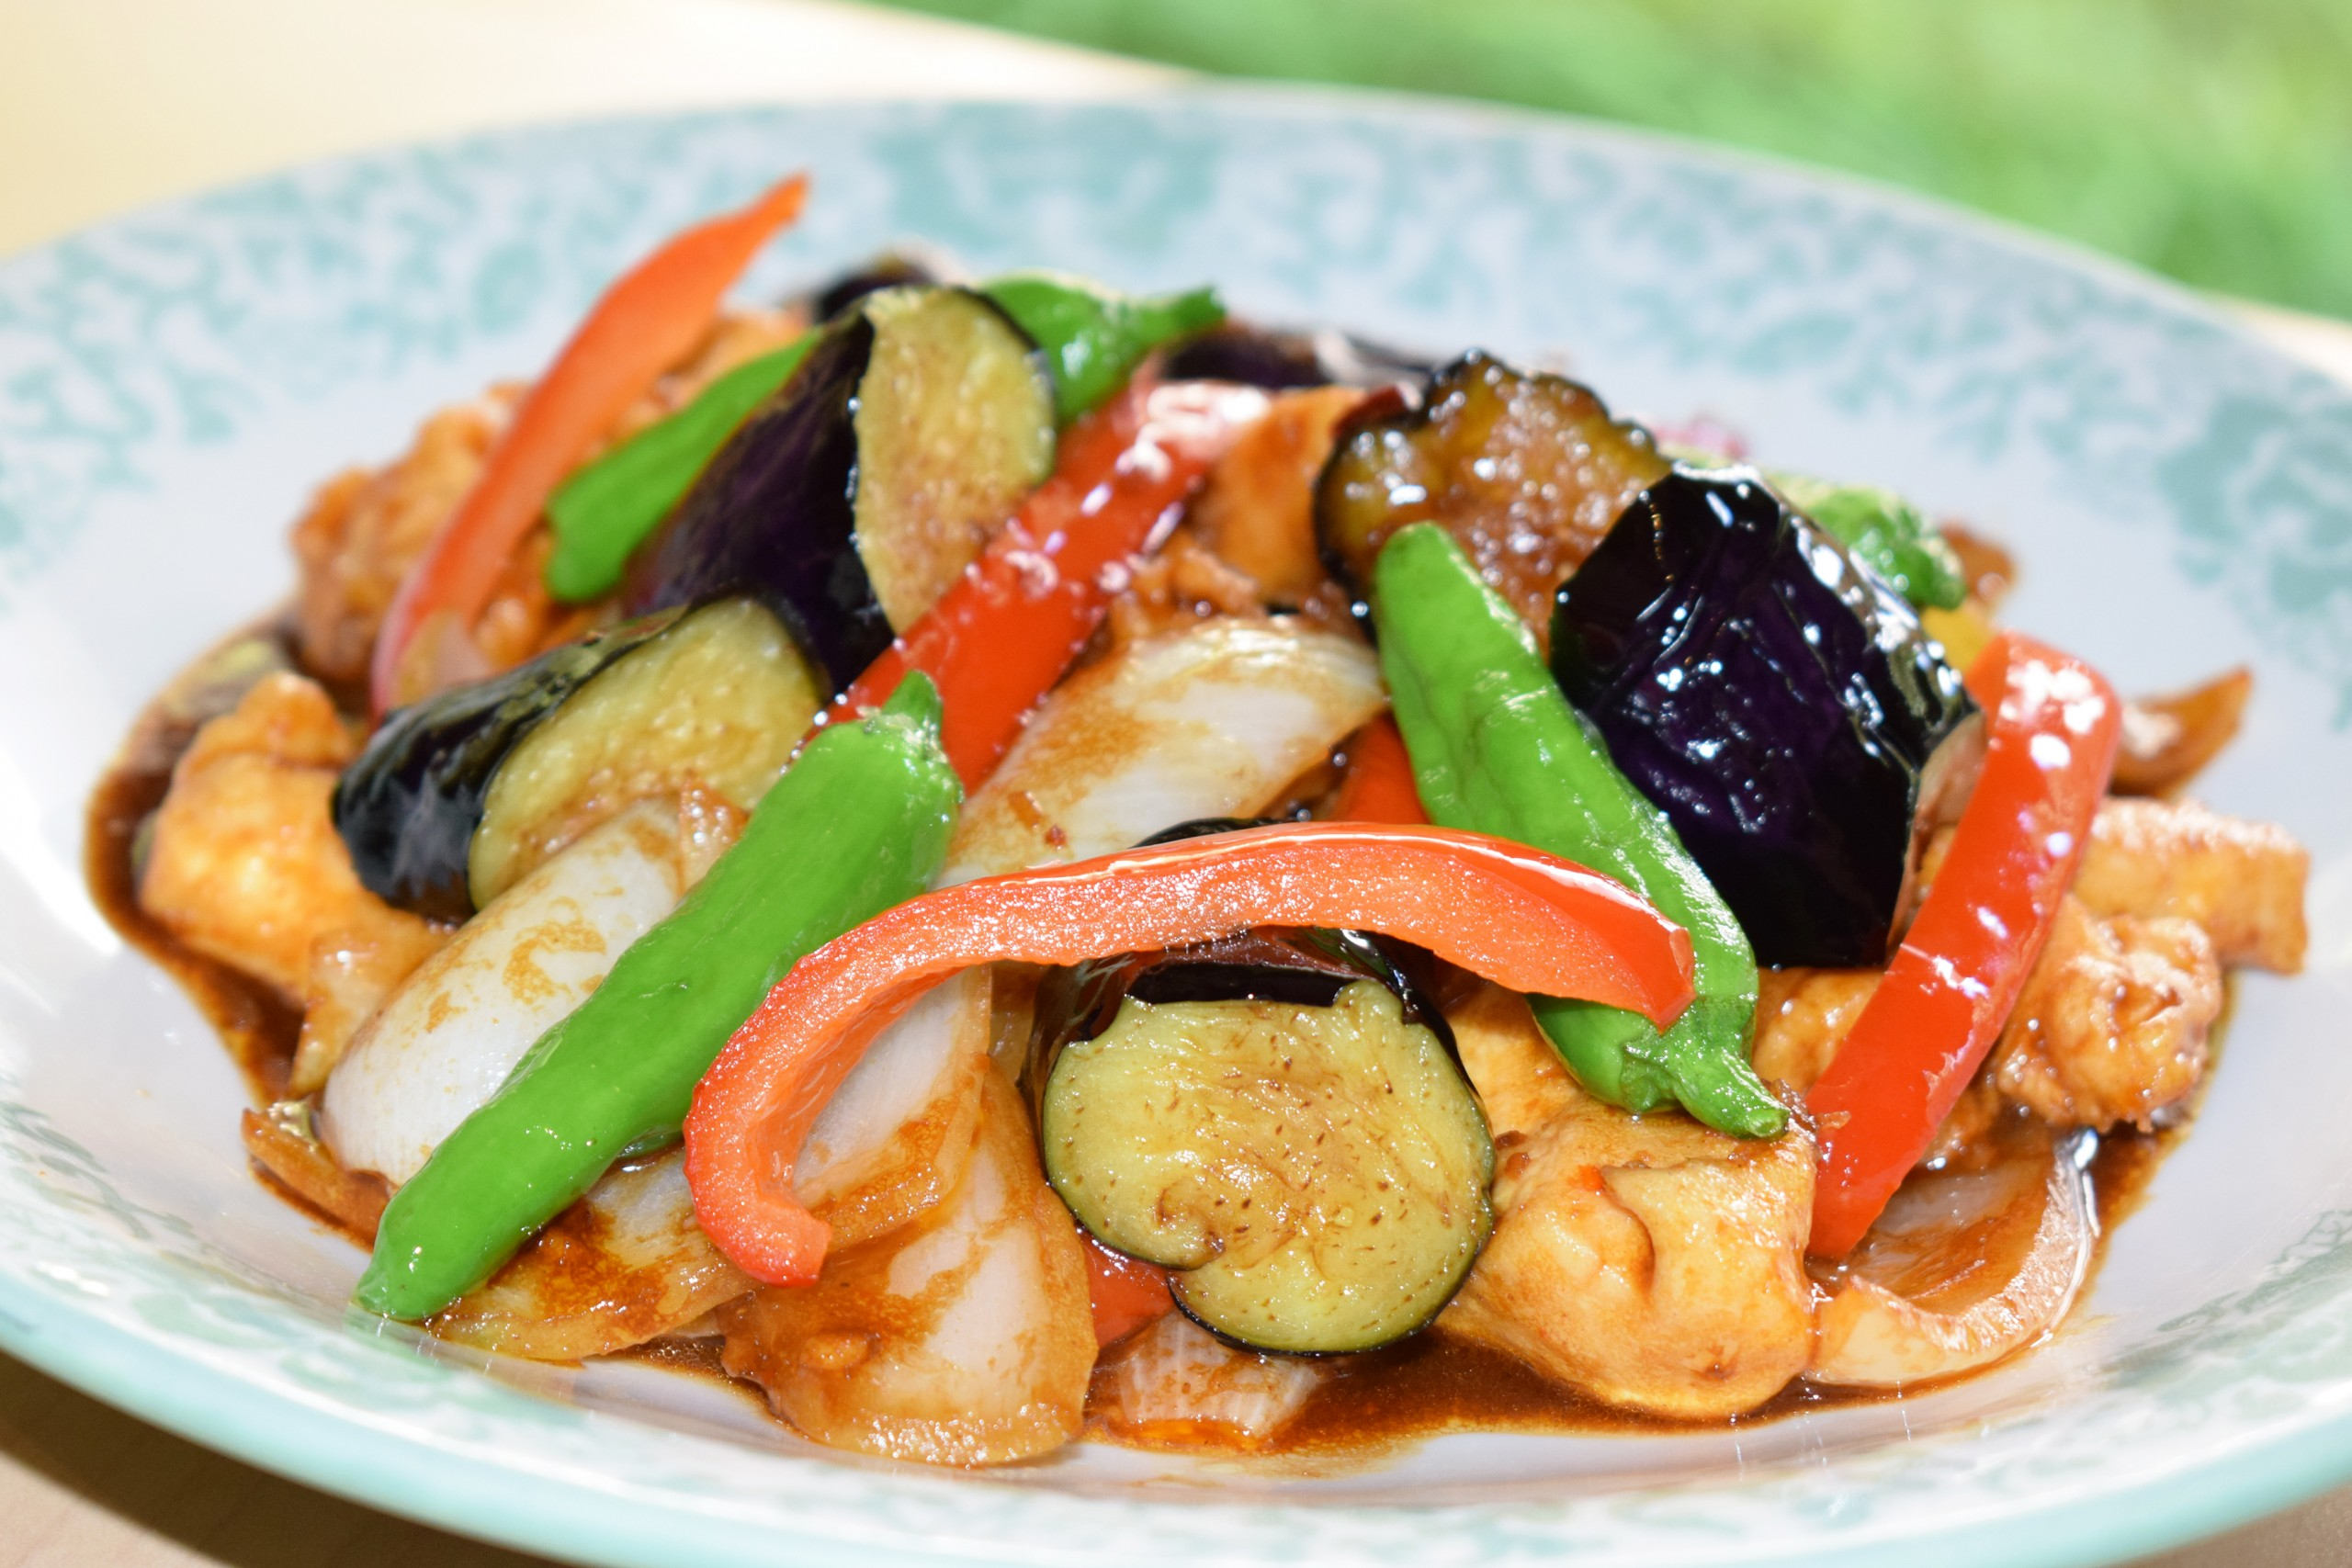 【NEW】鶏肉とナスのピリ辛味噌炒め<br />ご飯・中華スープ・ドリンク付